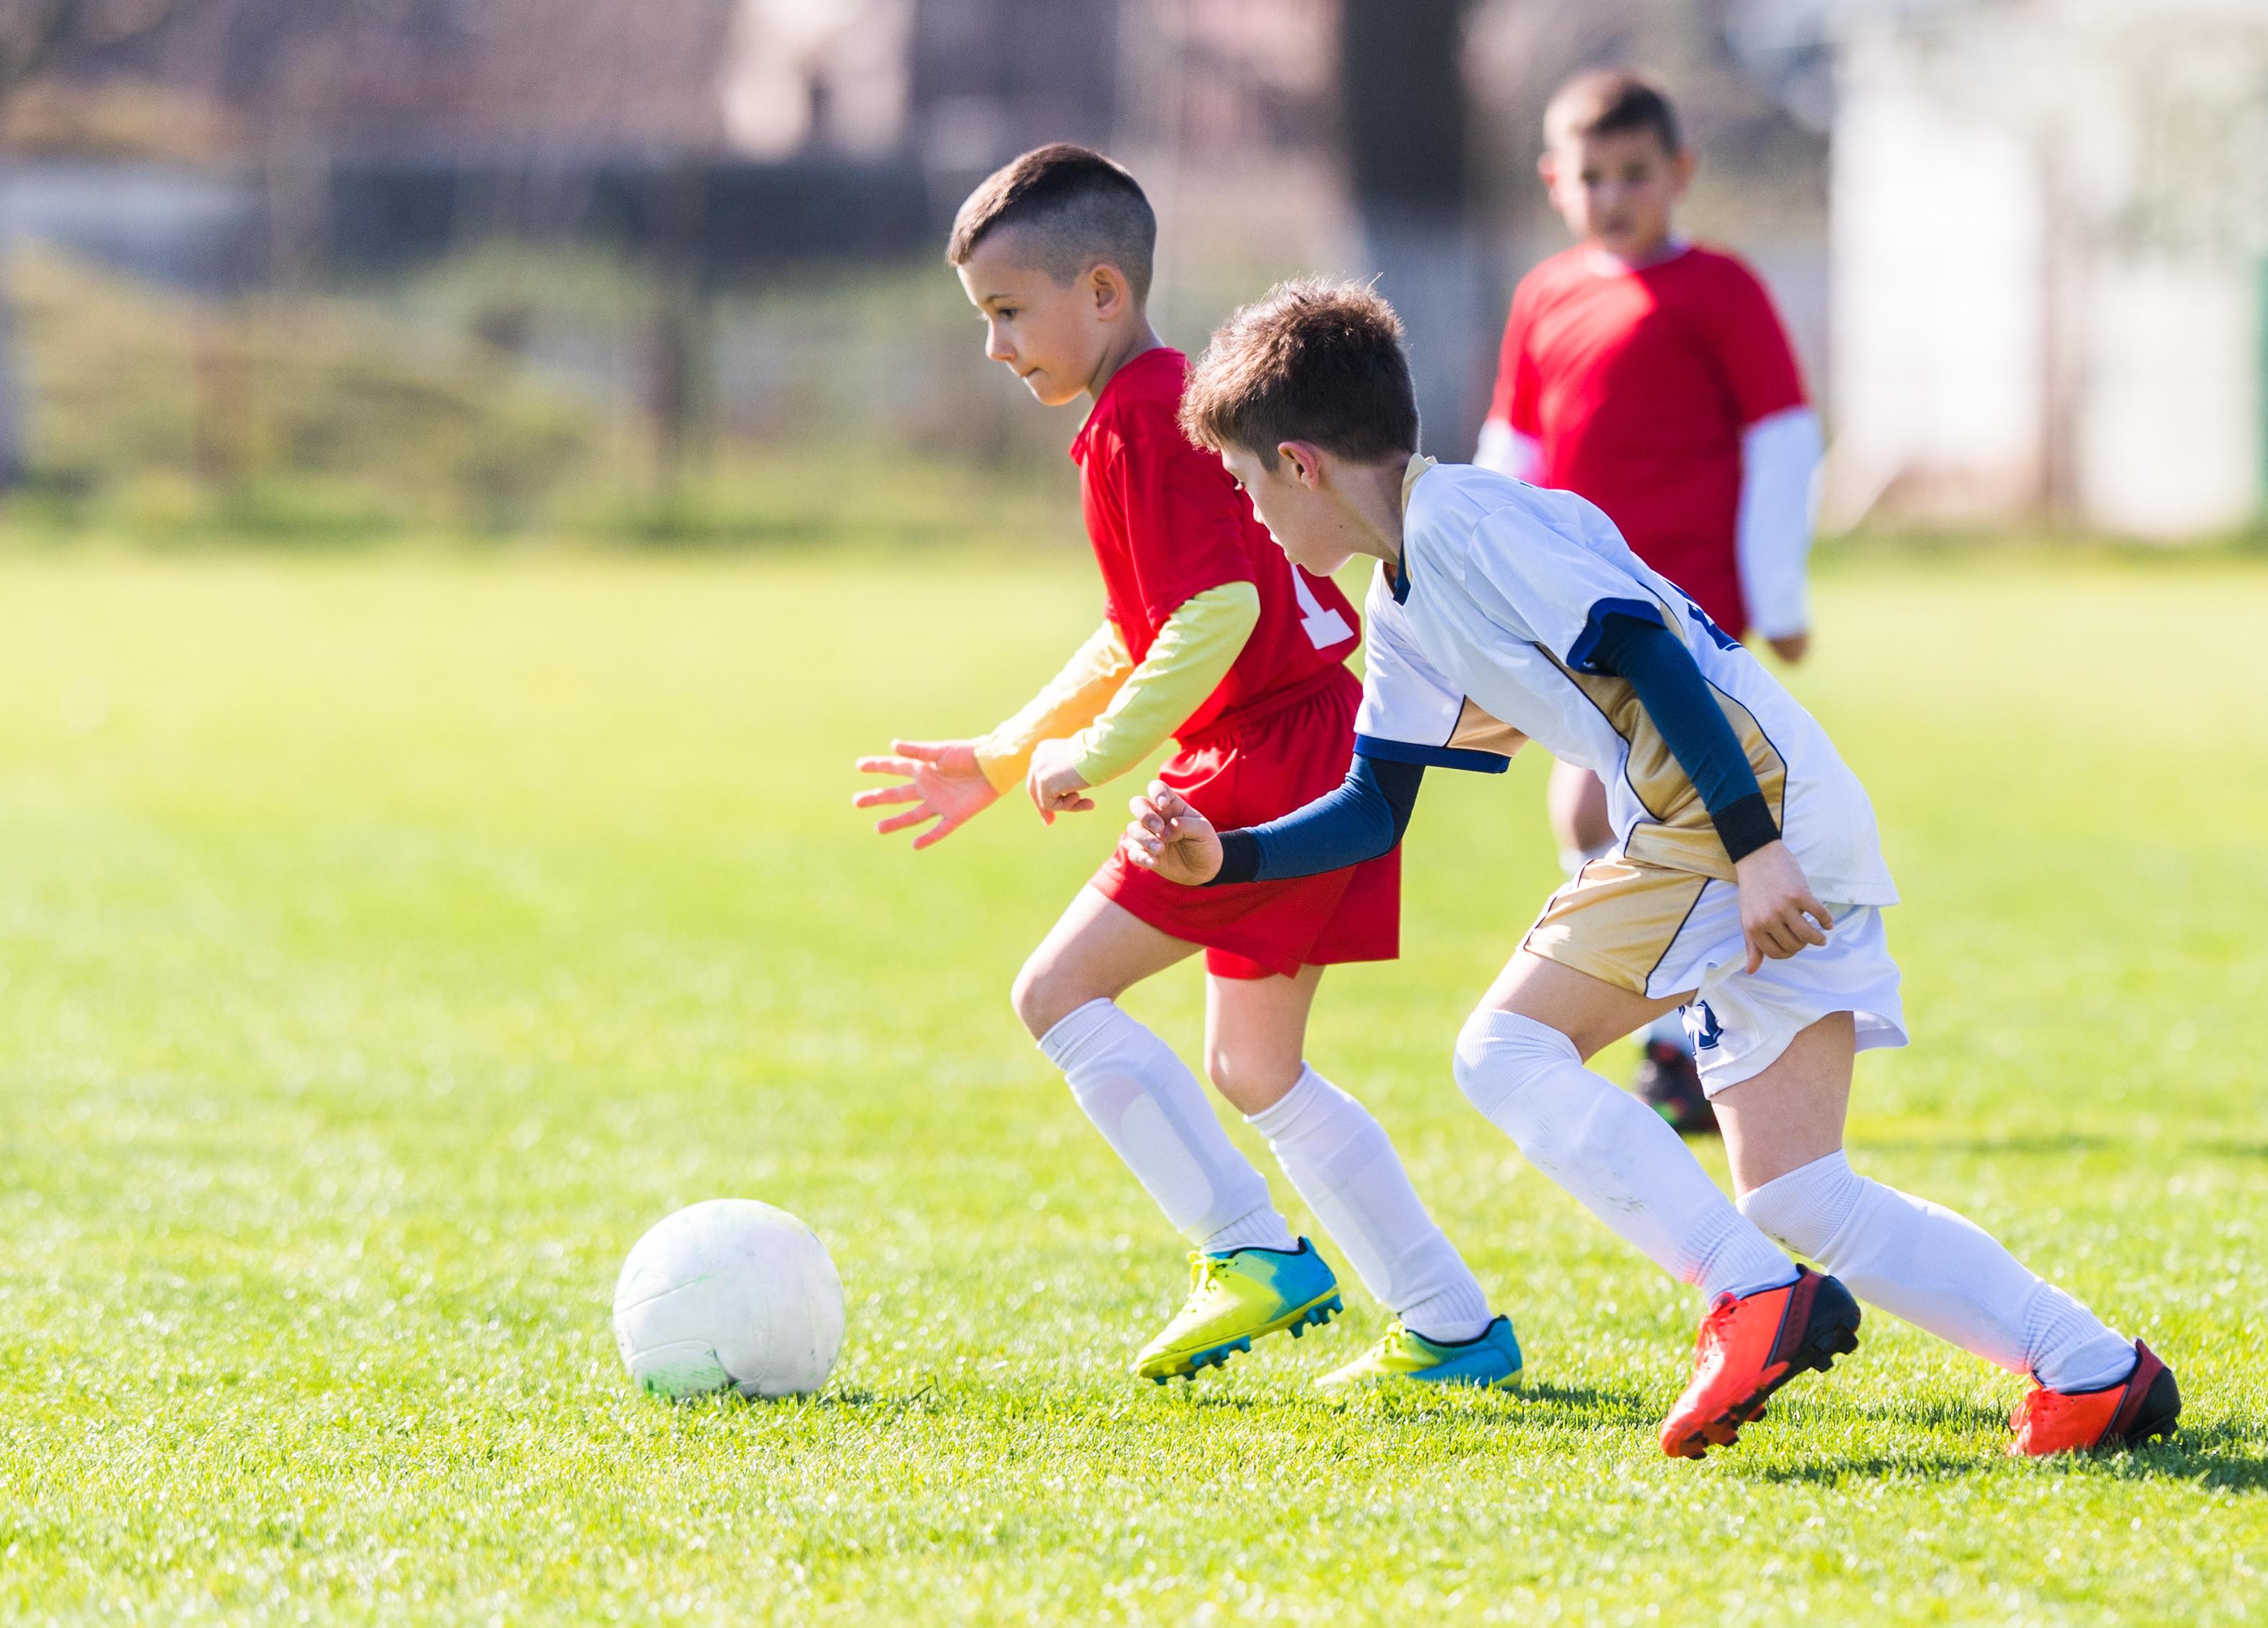 Football garcon enfants.jpeg